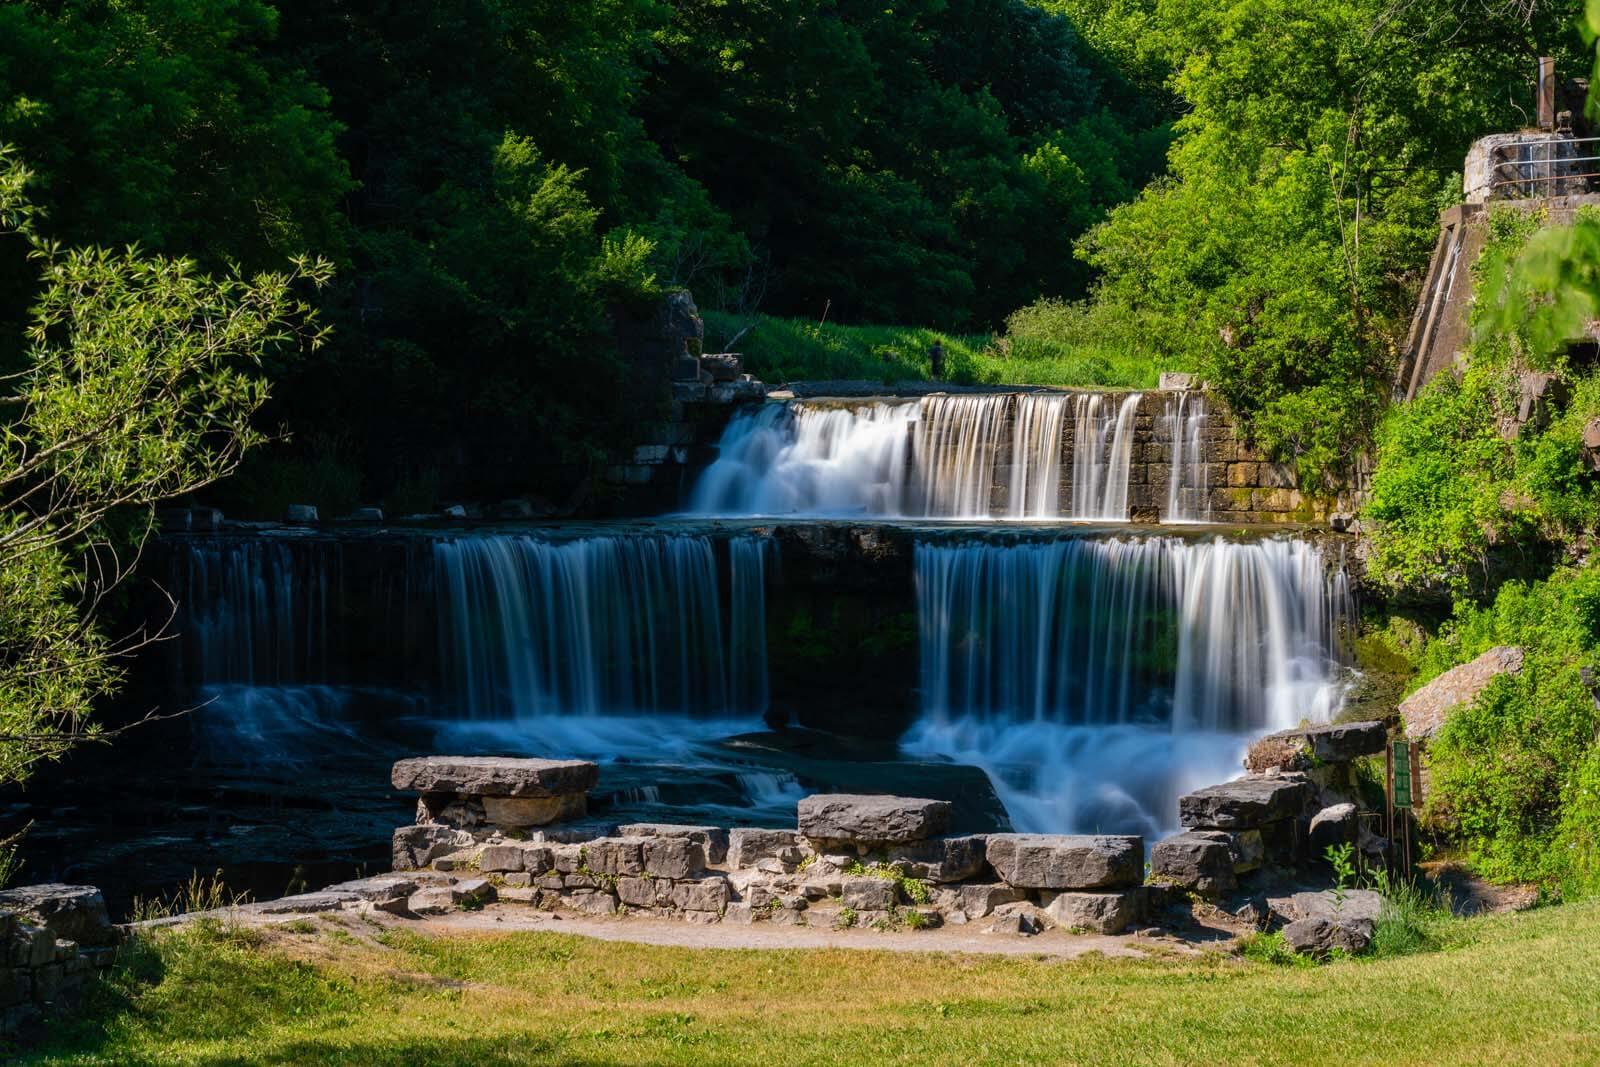 Seneca Mills Falls waterfalls in the Finger Lakes on the Keuka Outlet Trail near Penn Yan New York